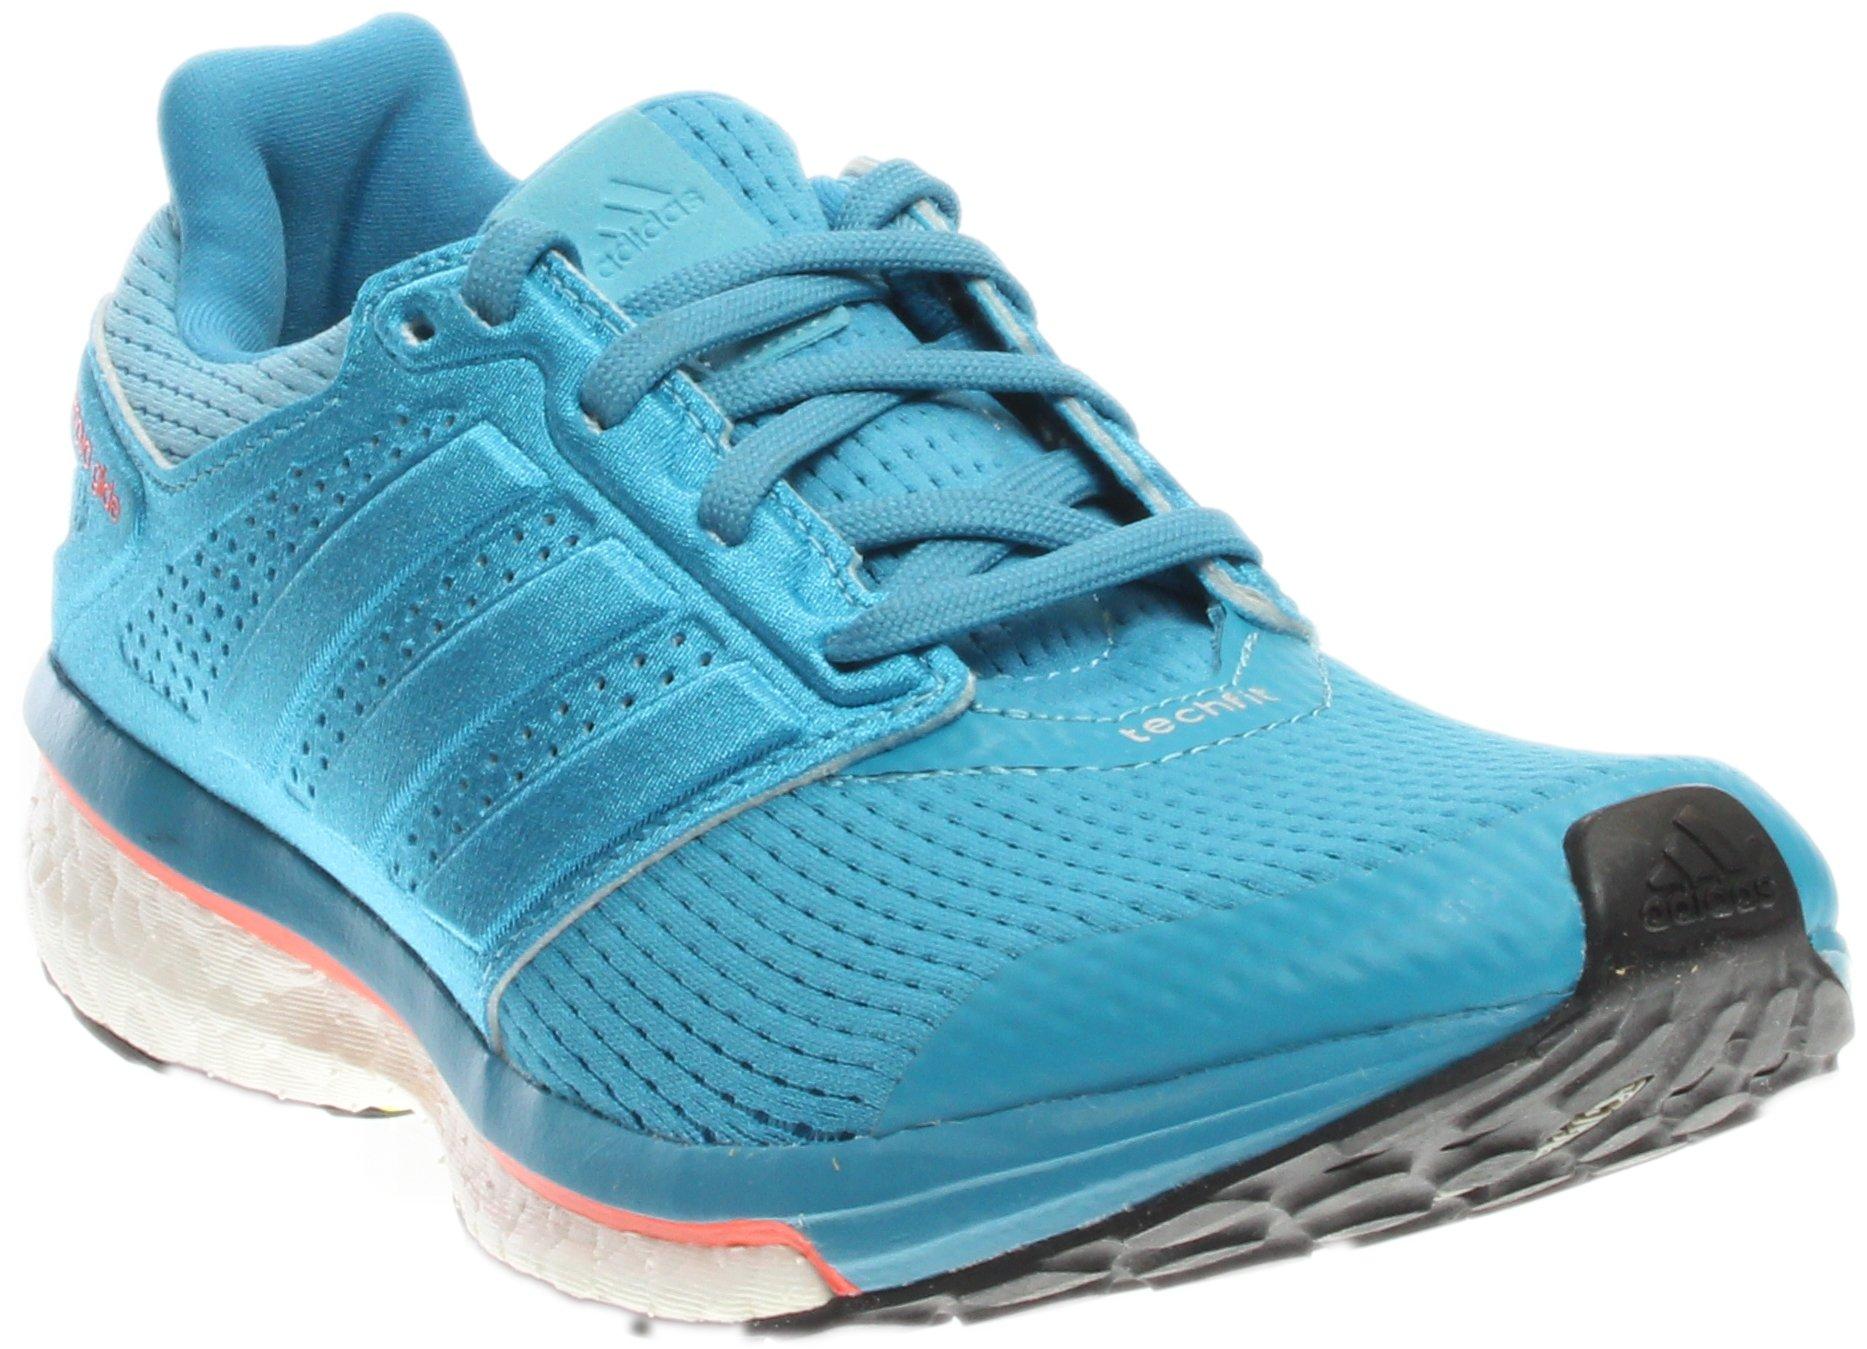 huge discount 568c1 75ba9 Galleon - Adidas Women s Supernova Glide 8 W Running Shoe, Craft F16 Craft  F16 Vapor Blue F16, 5 M US